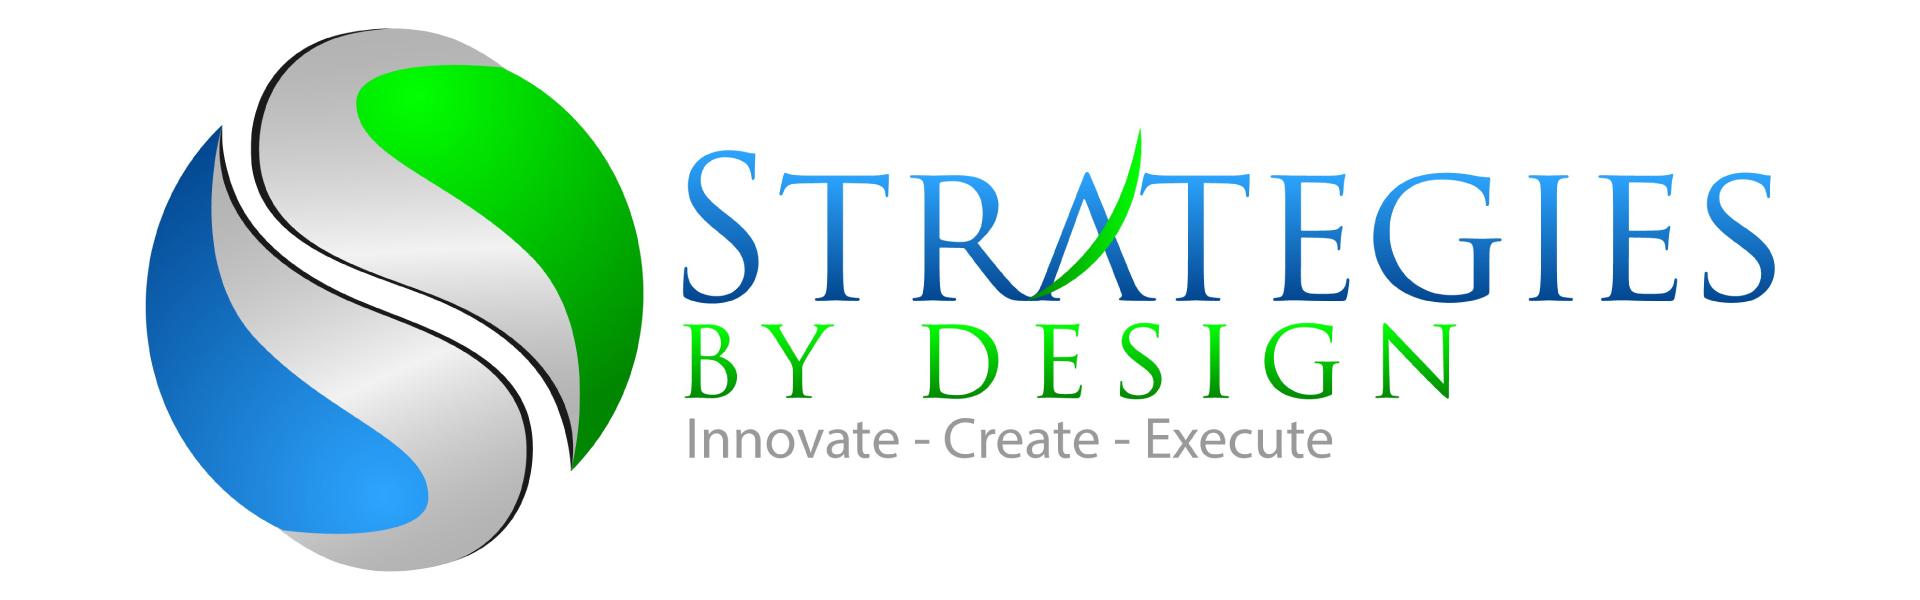 Strategies by Design